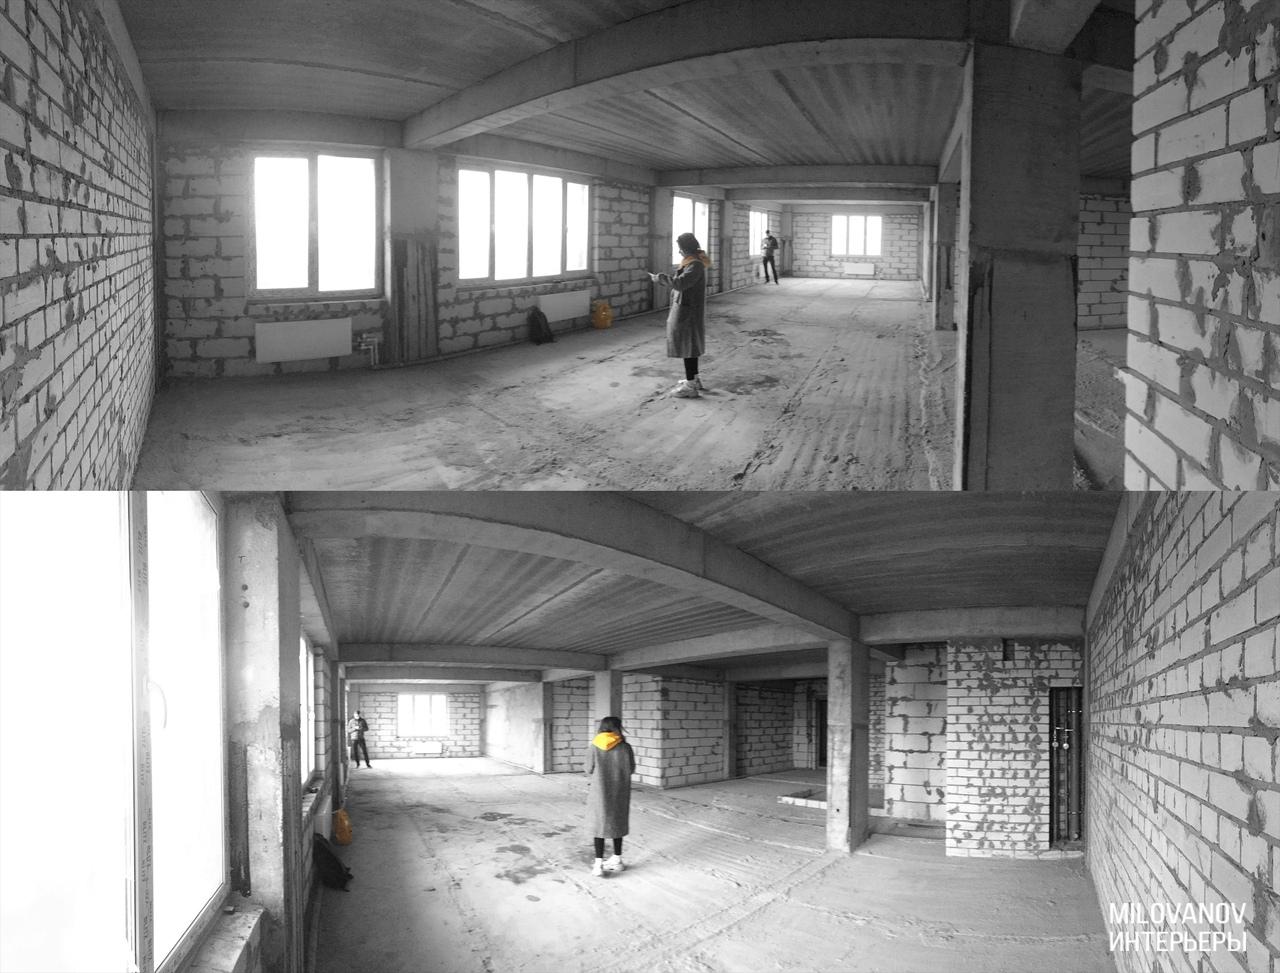 Проект от студии MILOVANOV INTERIOR DESIGN.